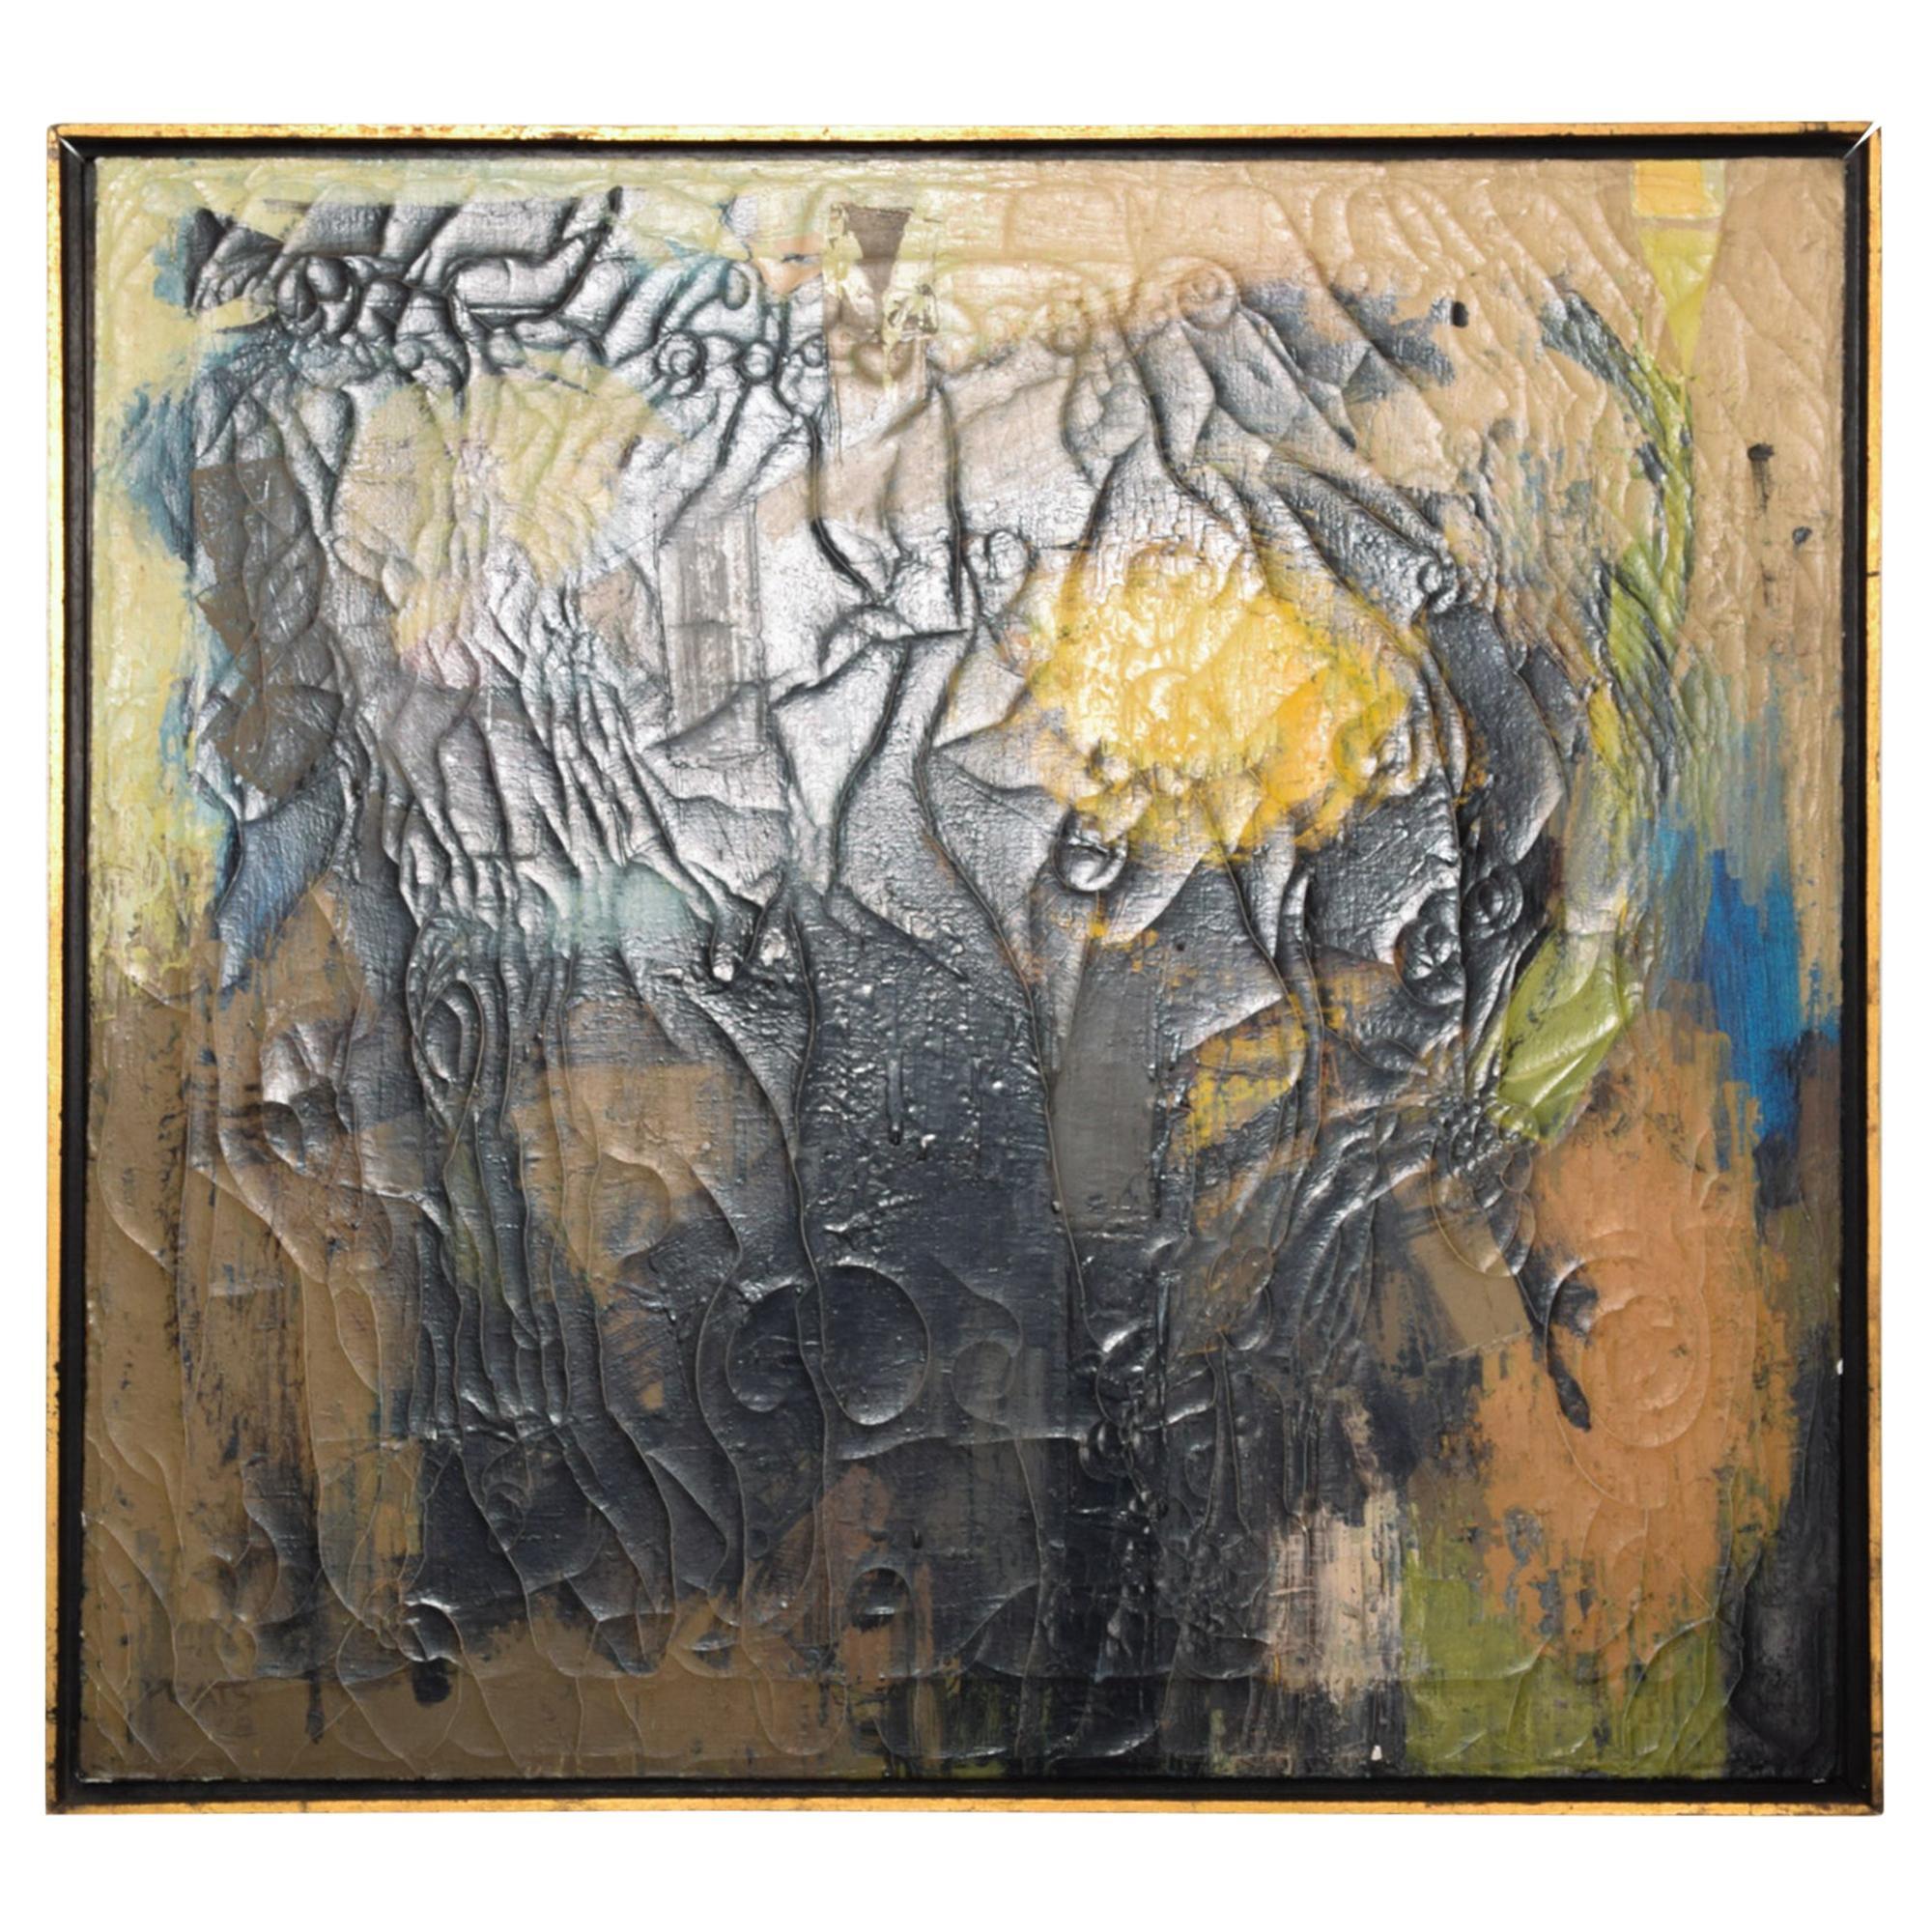 Miguel Alvarez Acosta Abstract Art Oil Painting on Canvas Mexico City 1950s INBA